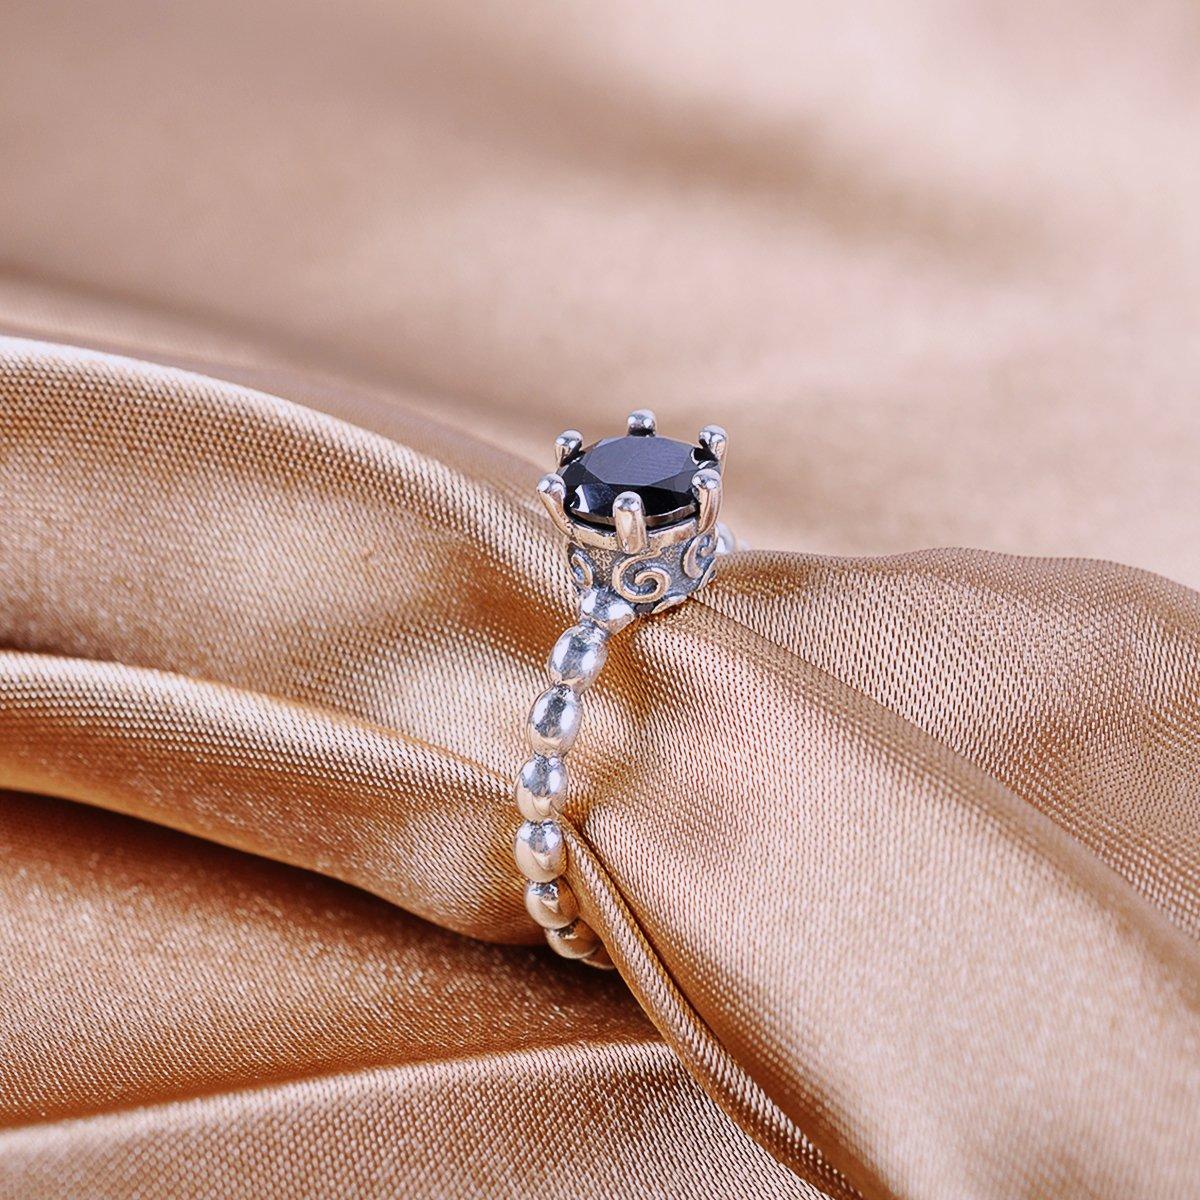 Amazon.com: Twenty Plus Silver Ring with Black Cubic Zirconia For ...